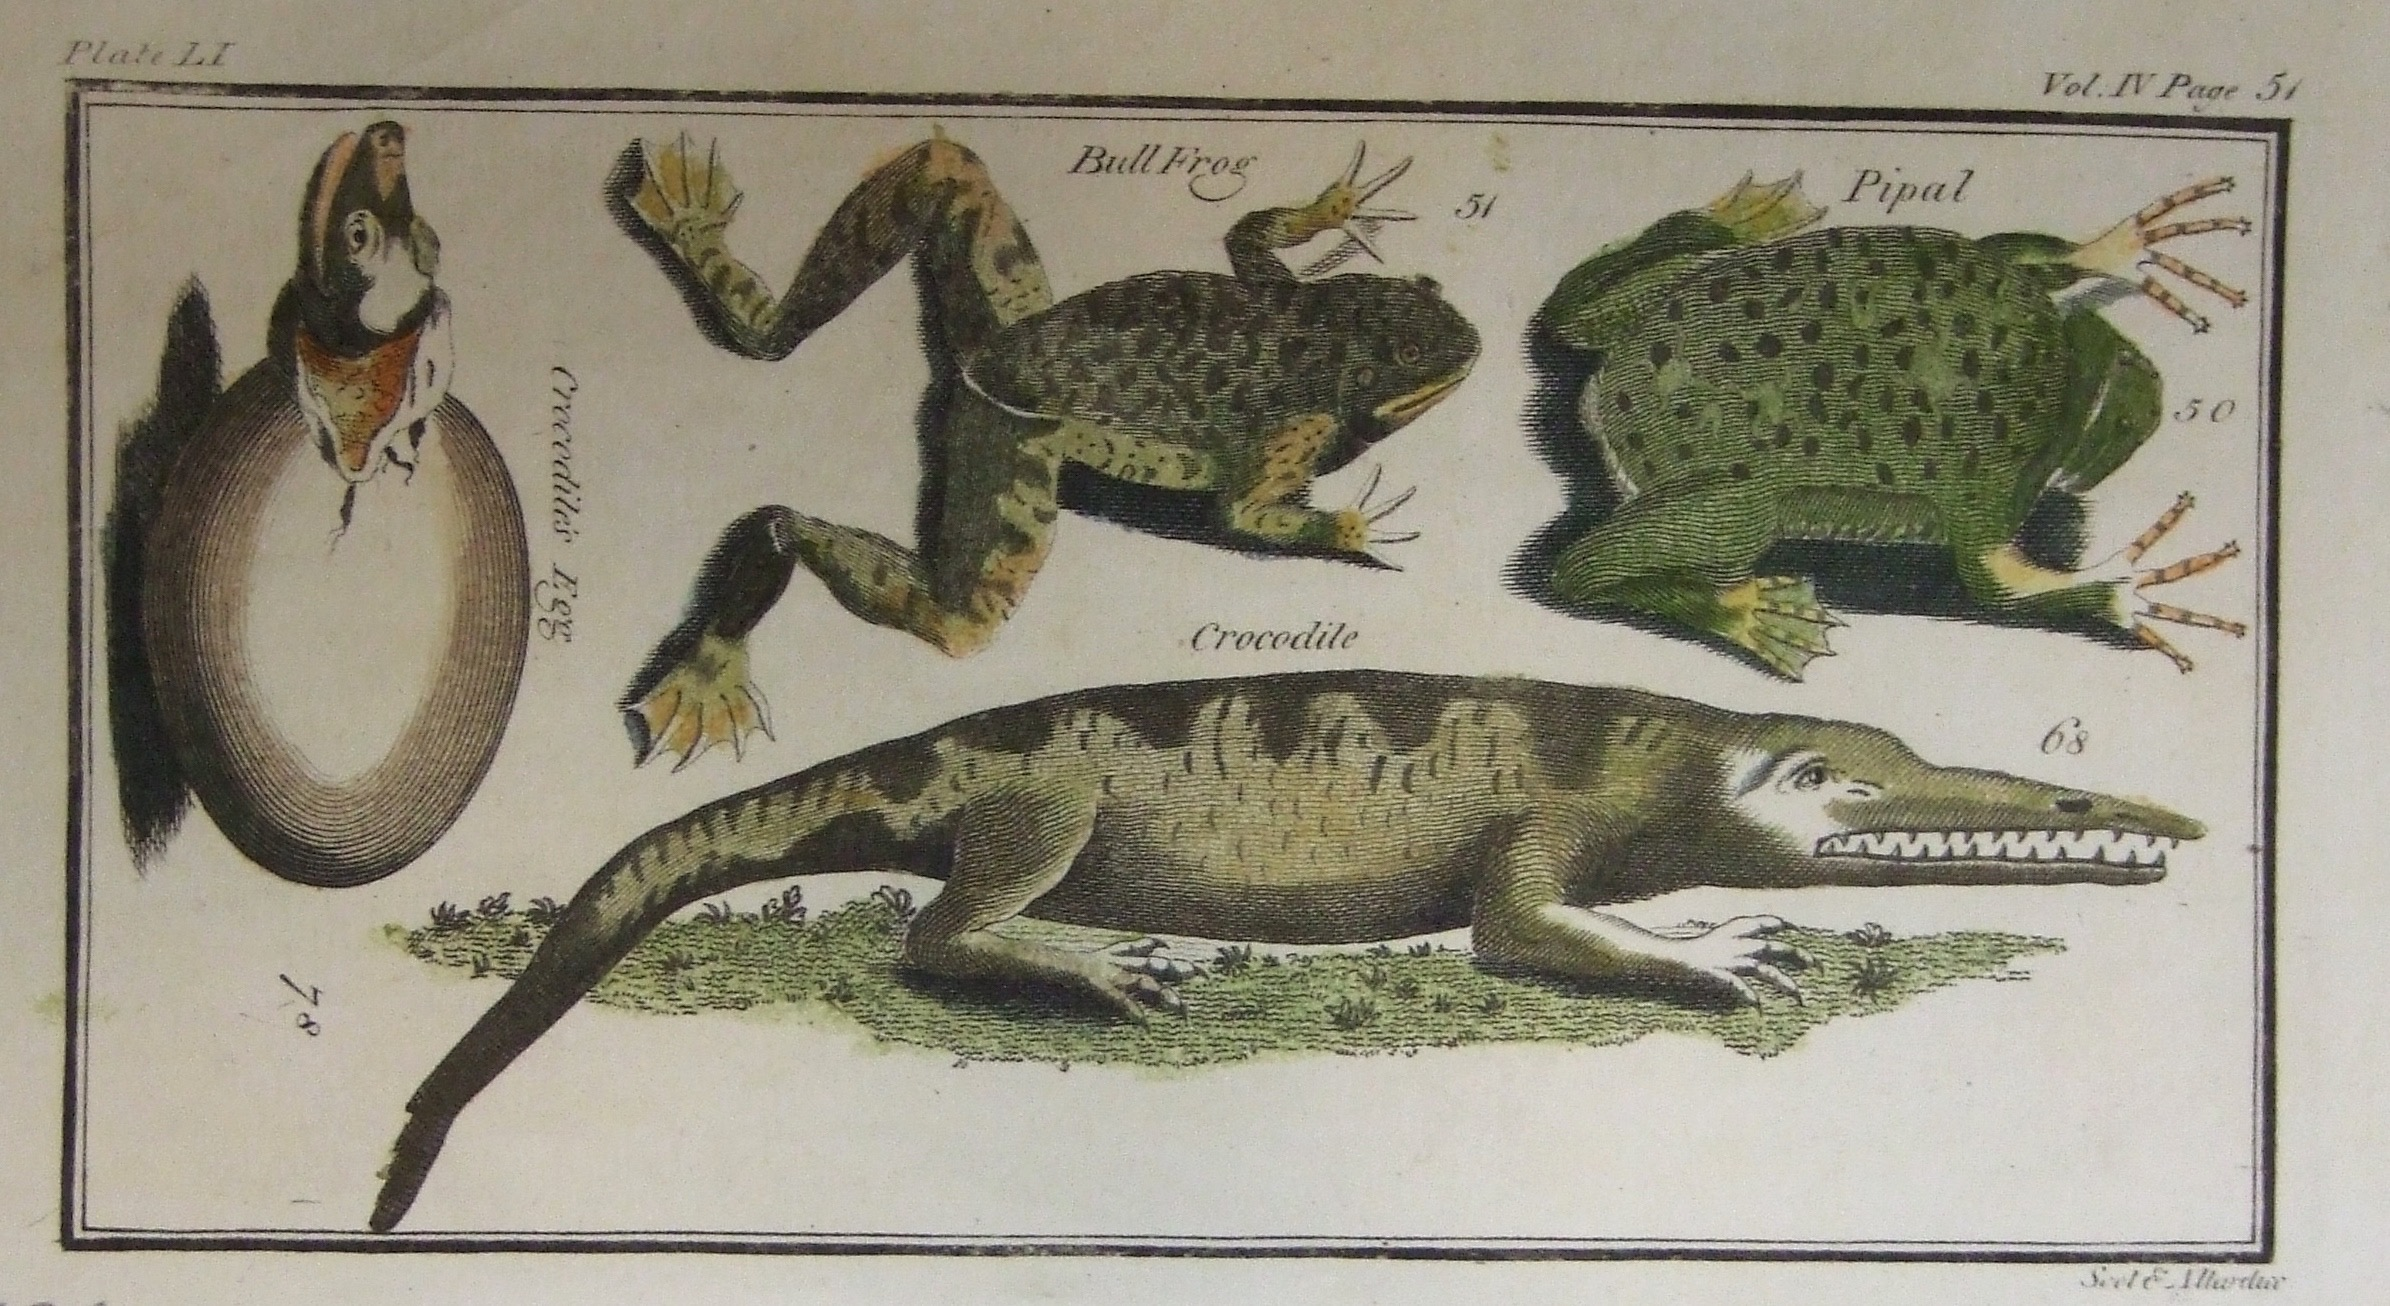 Pipal, Crocodile, Bull Frog, Crocodile Egg